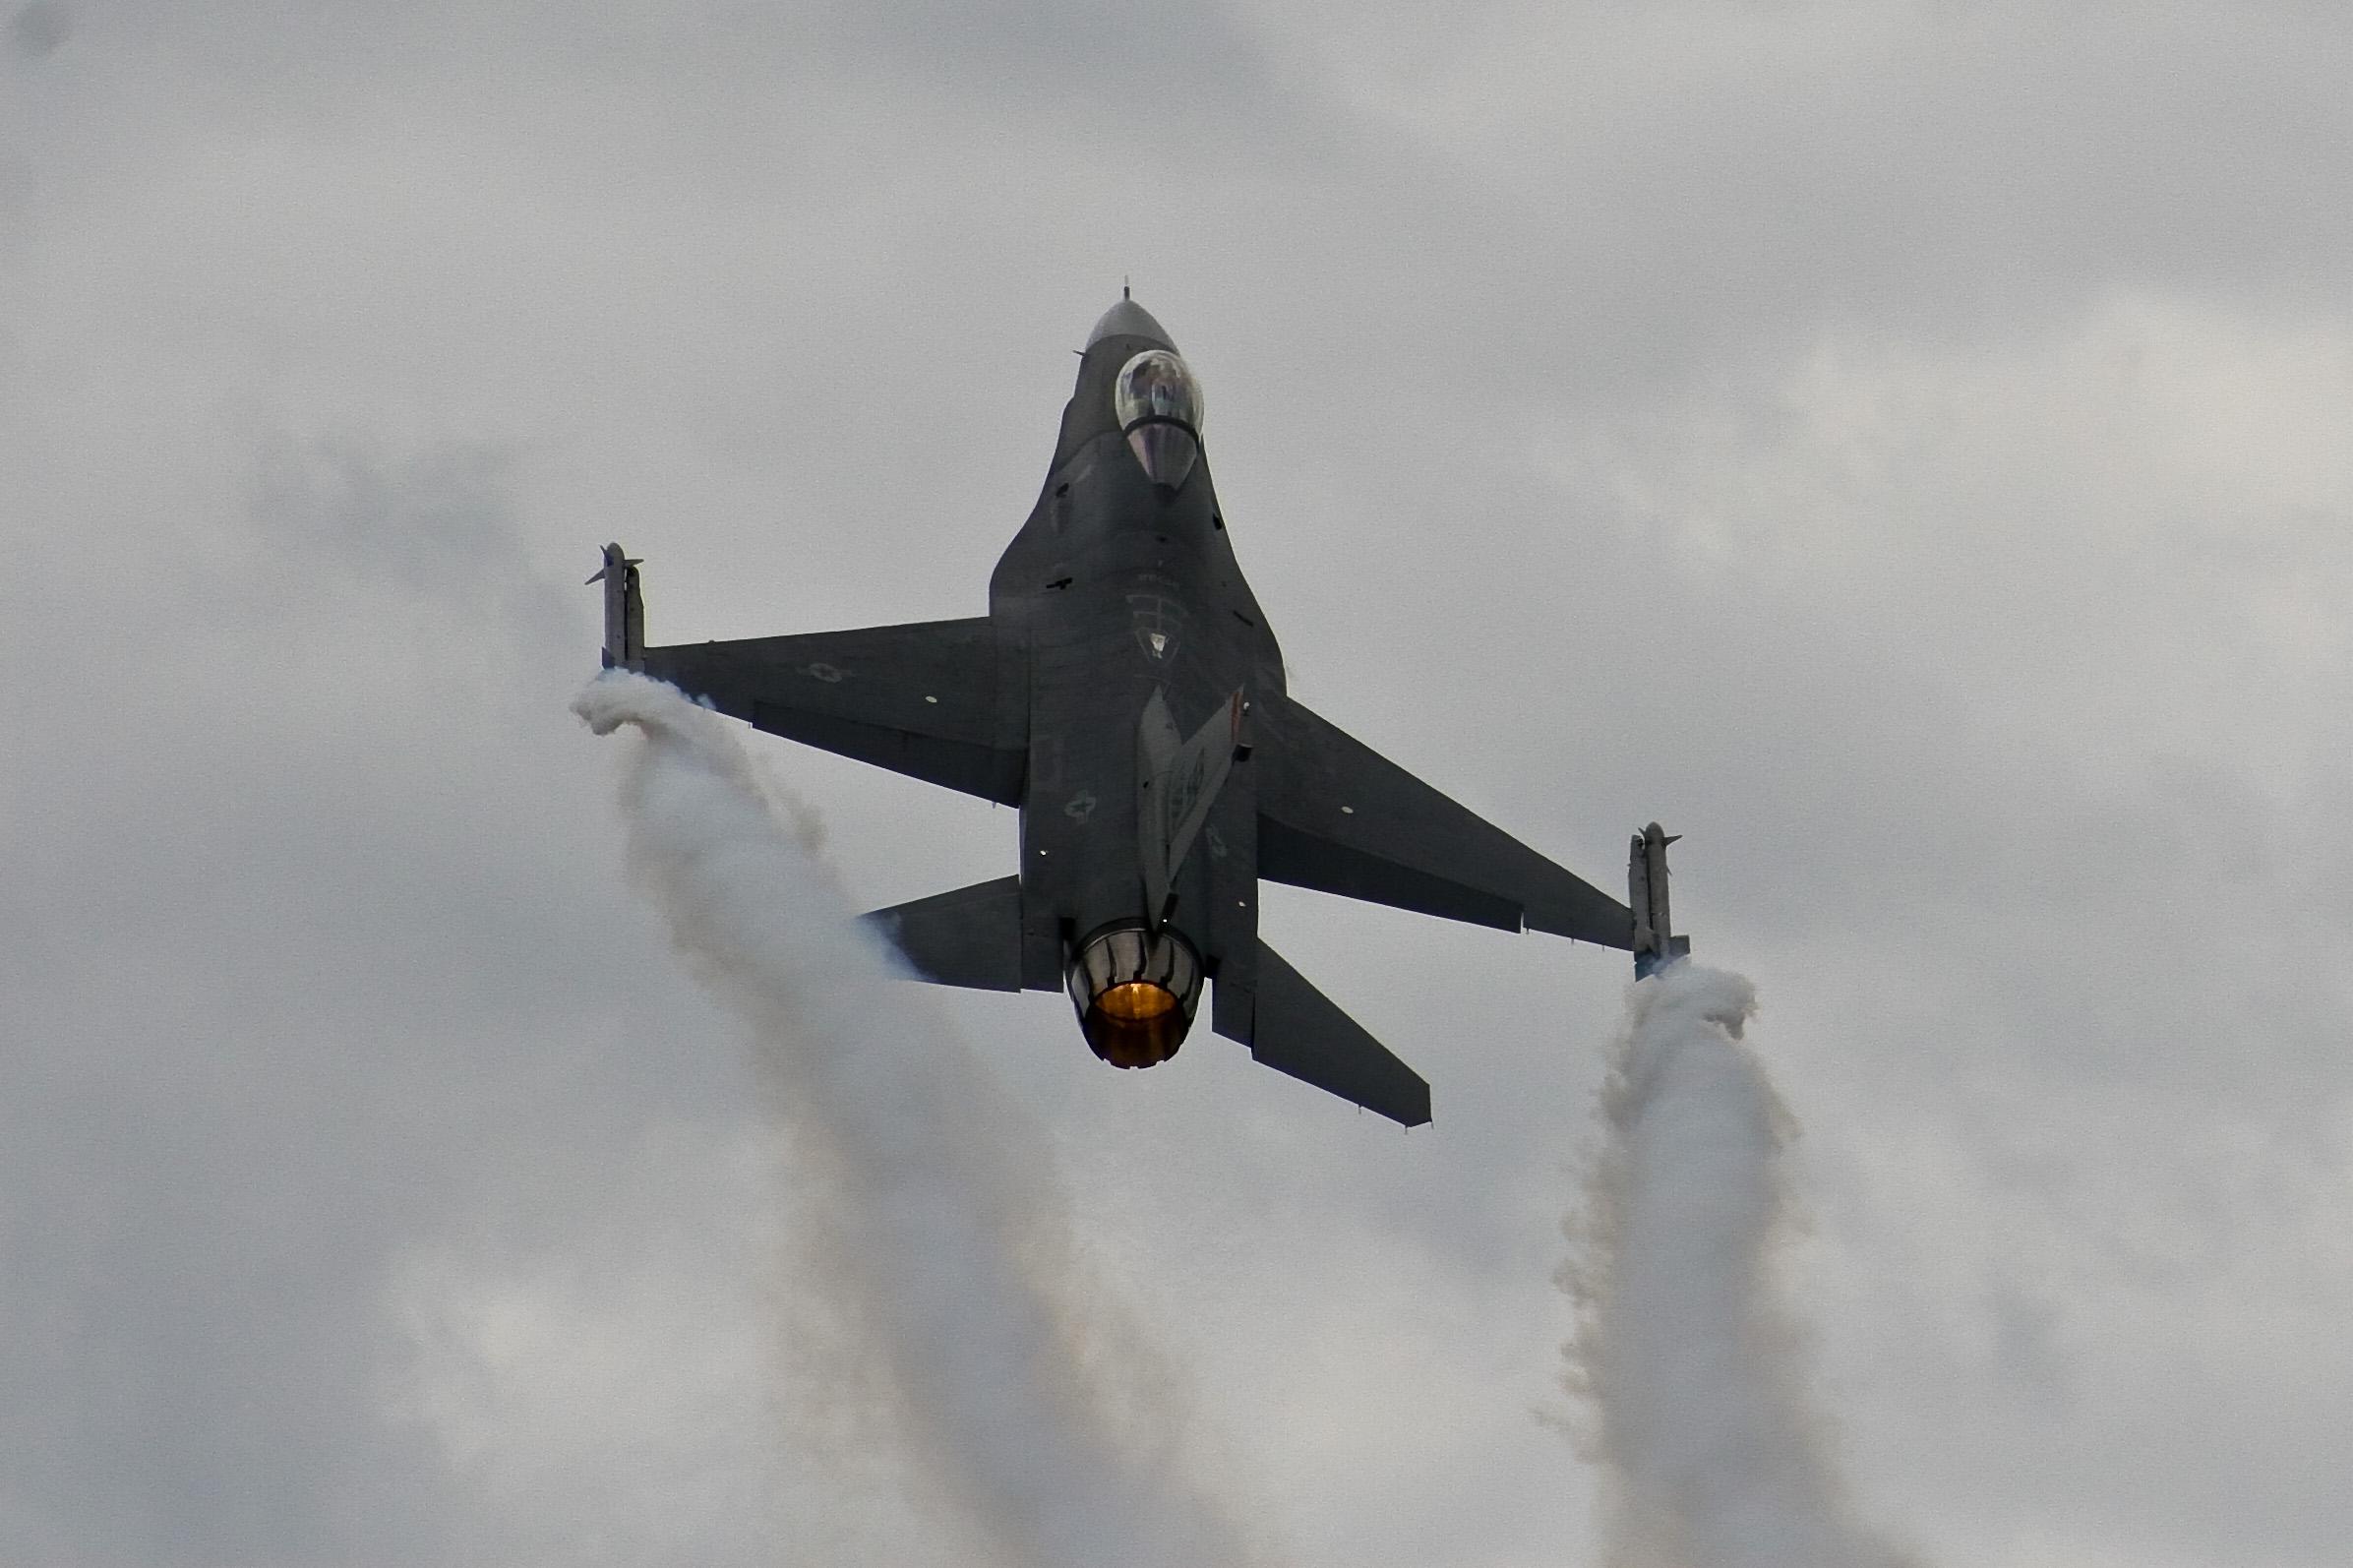 Free Images : wing, smoke, airplane, vehicle, aviation, flight